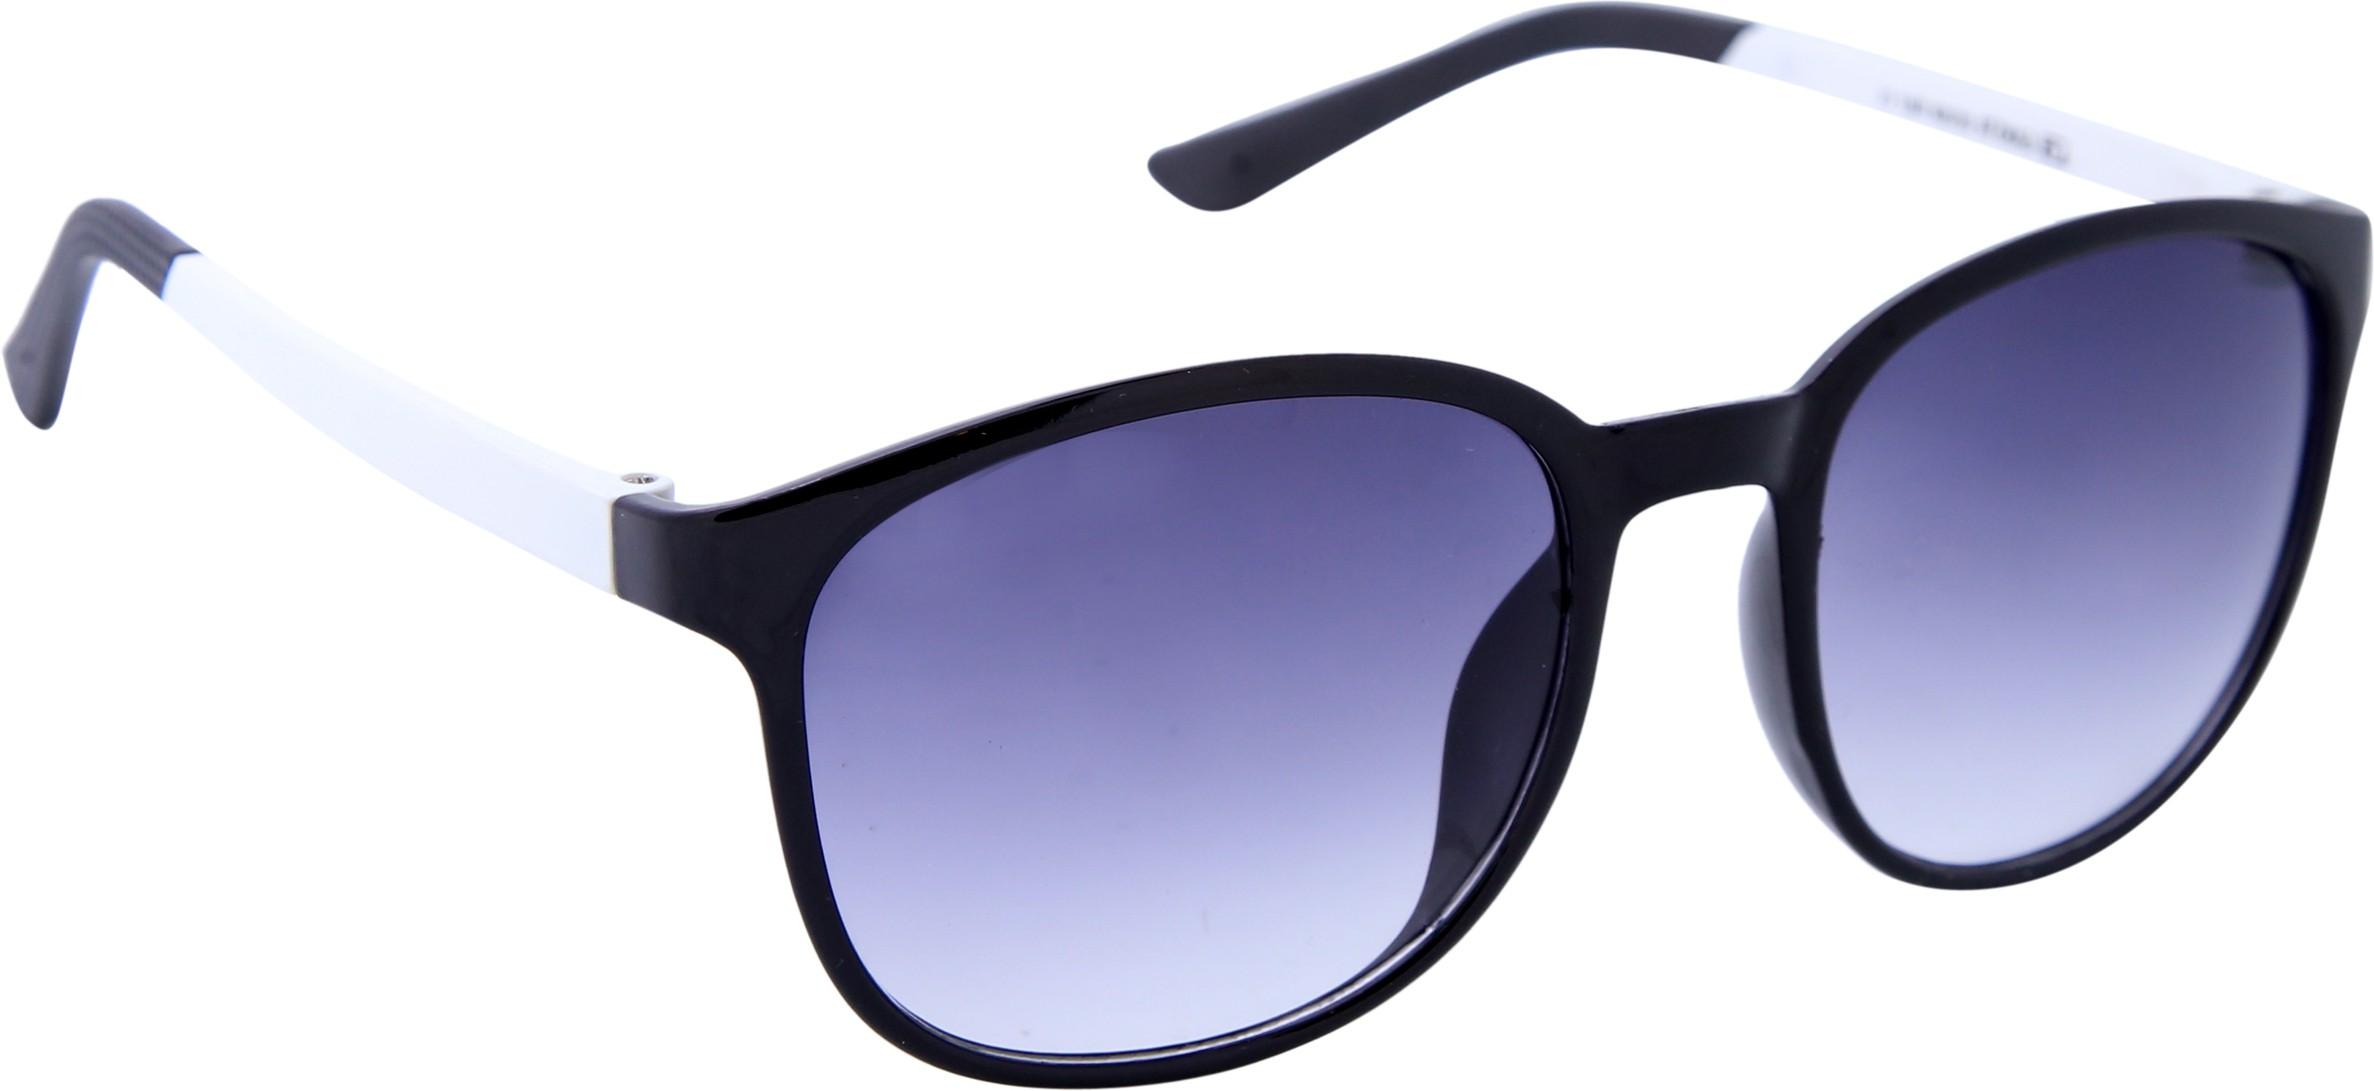 Flipkart - Sunglasses Gansta, Beqube...